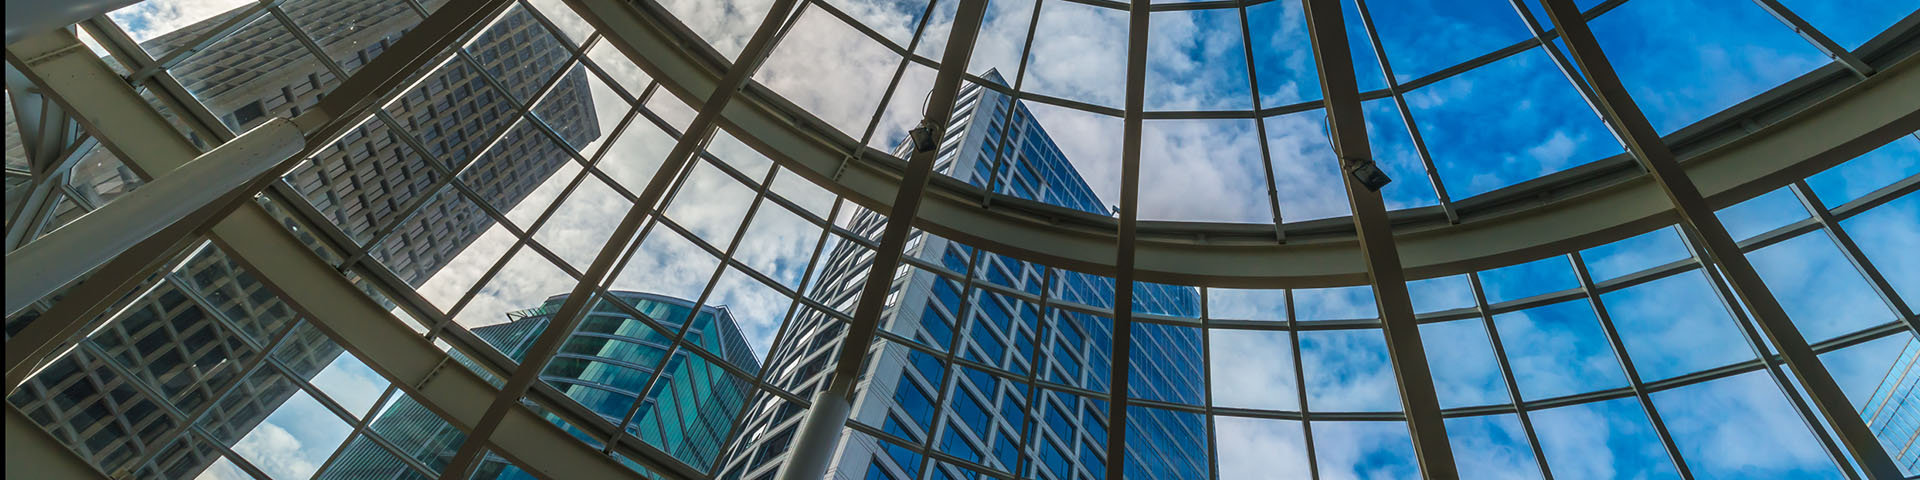 Fractional Interest Investing in Real Estate